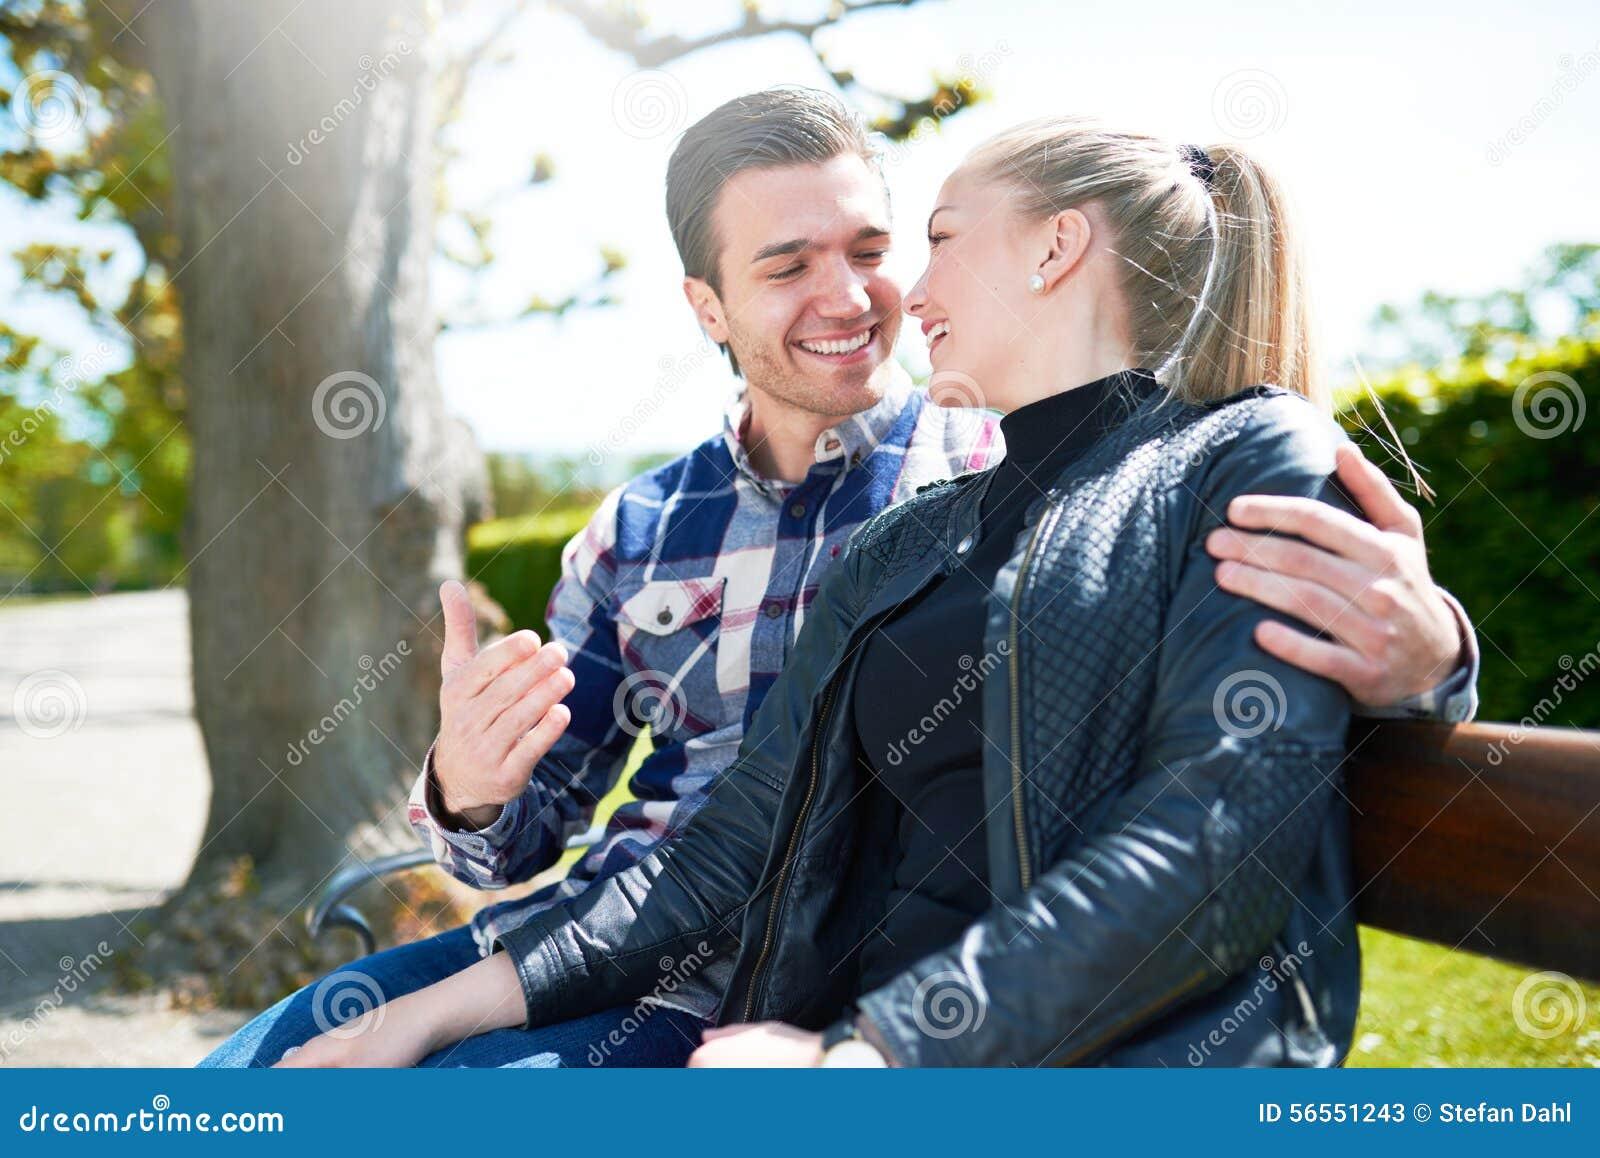 Download Γλυκιά νέα συνεδρίαση ζεύγους στον πάγκο στο πάρκο Στοκ Εικόνα - εικόνα από closeup, χρονολόγηση: 56551243